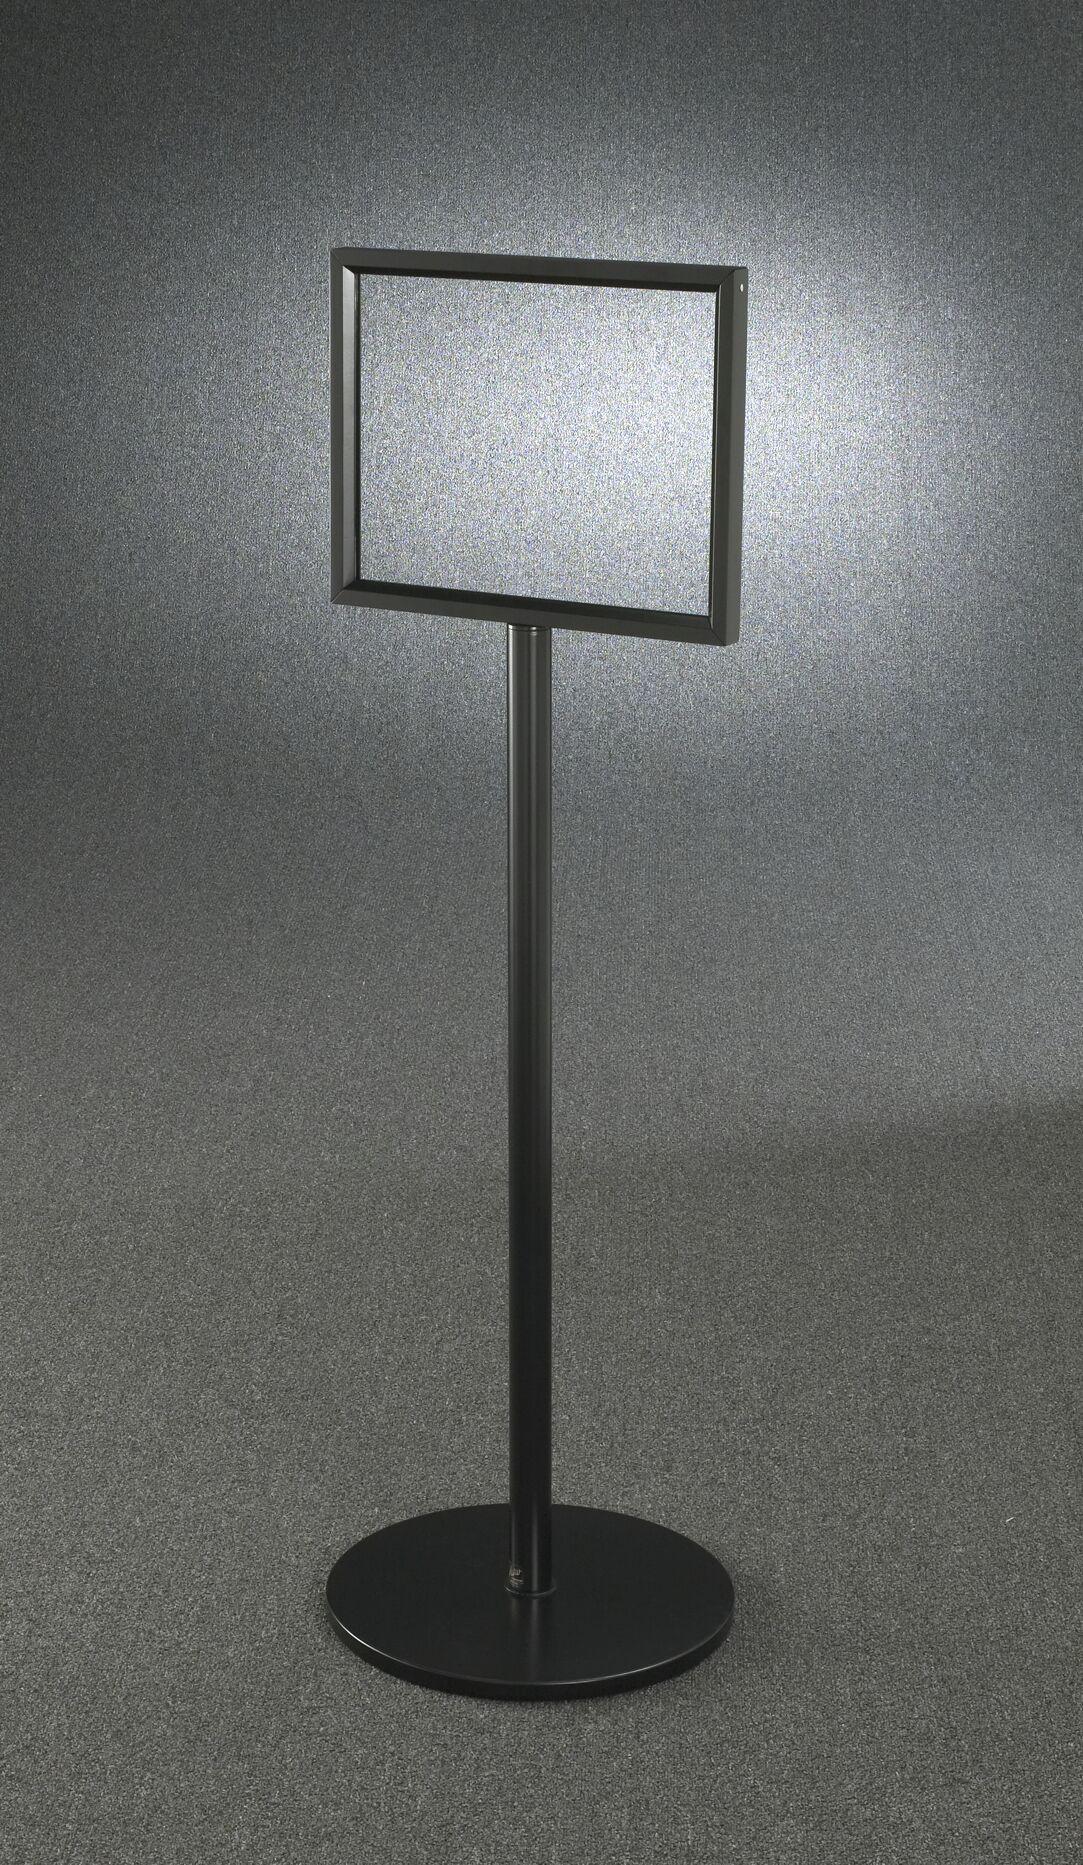 Standard Floor Standing Sign Frame Stand Size: 48